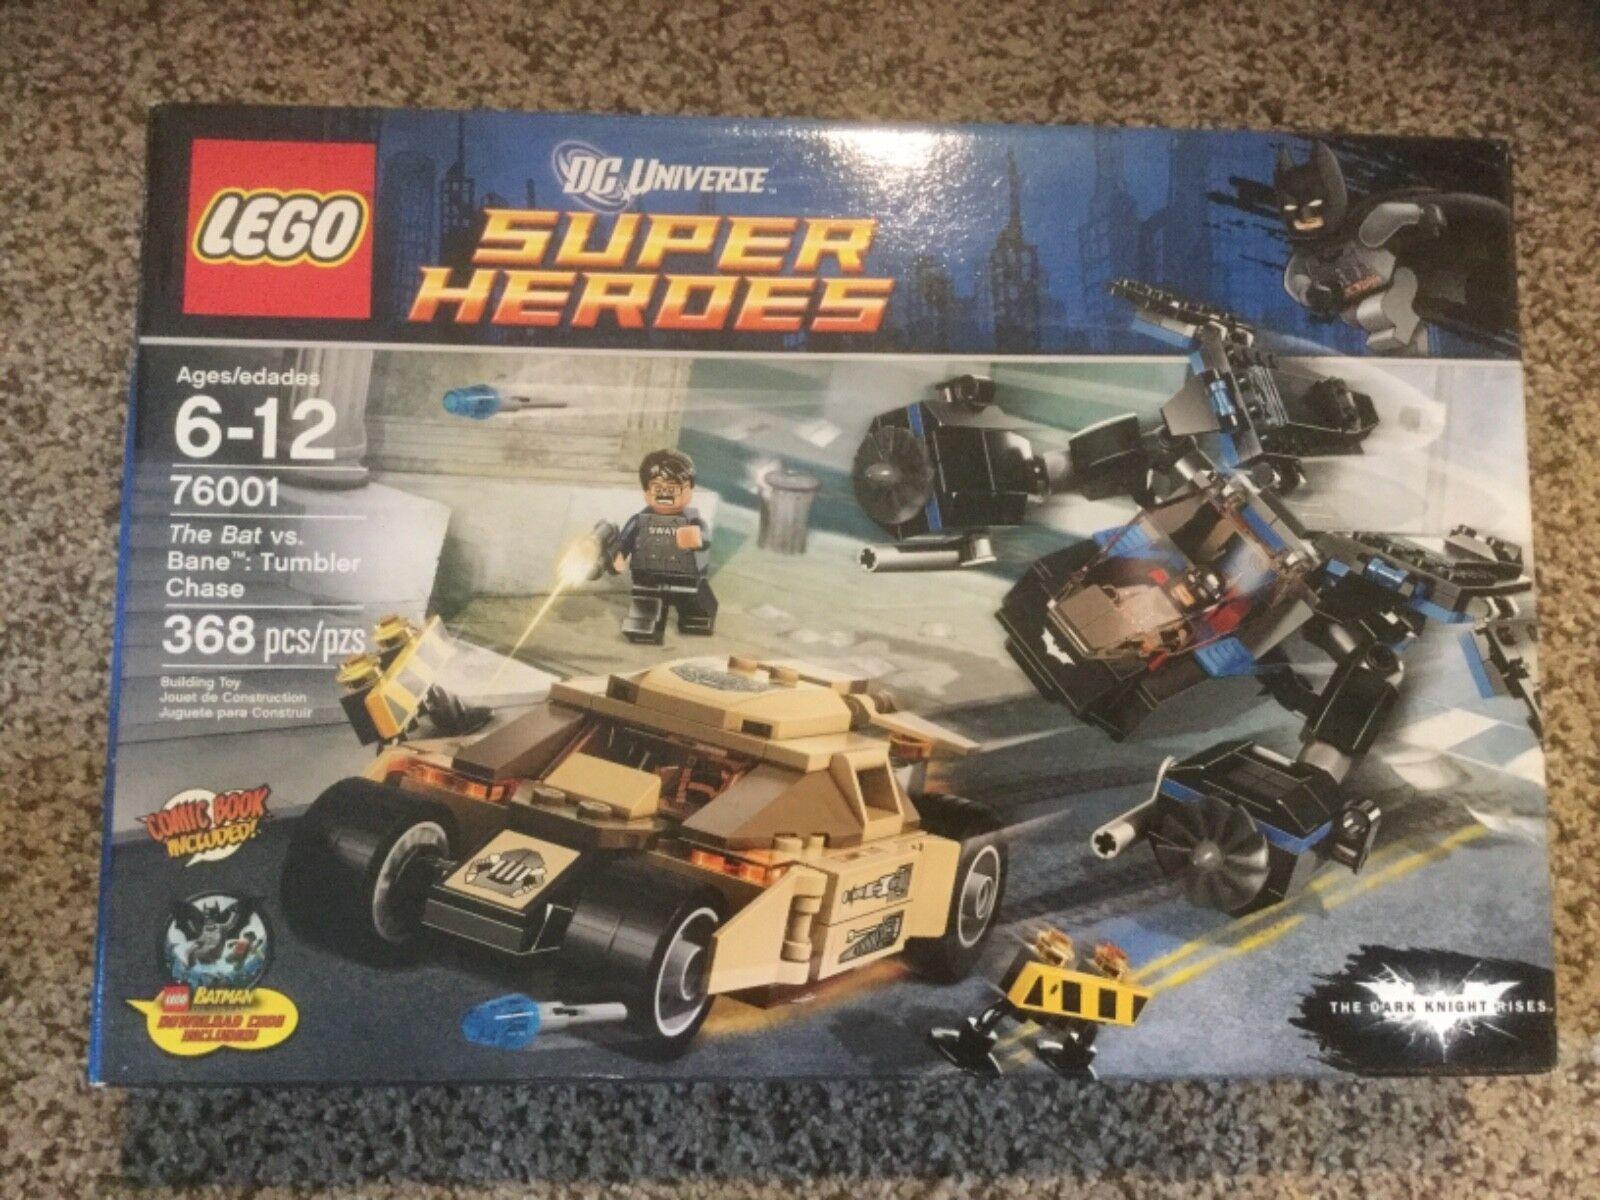 NIB LEGO Super Heroes The Bat Bat Bat vs. Bane Tumbler Chase (76001) 8a5be4